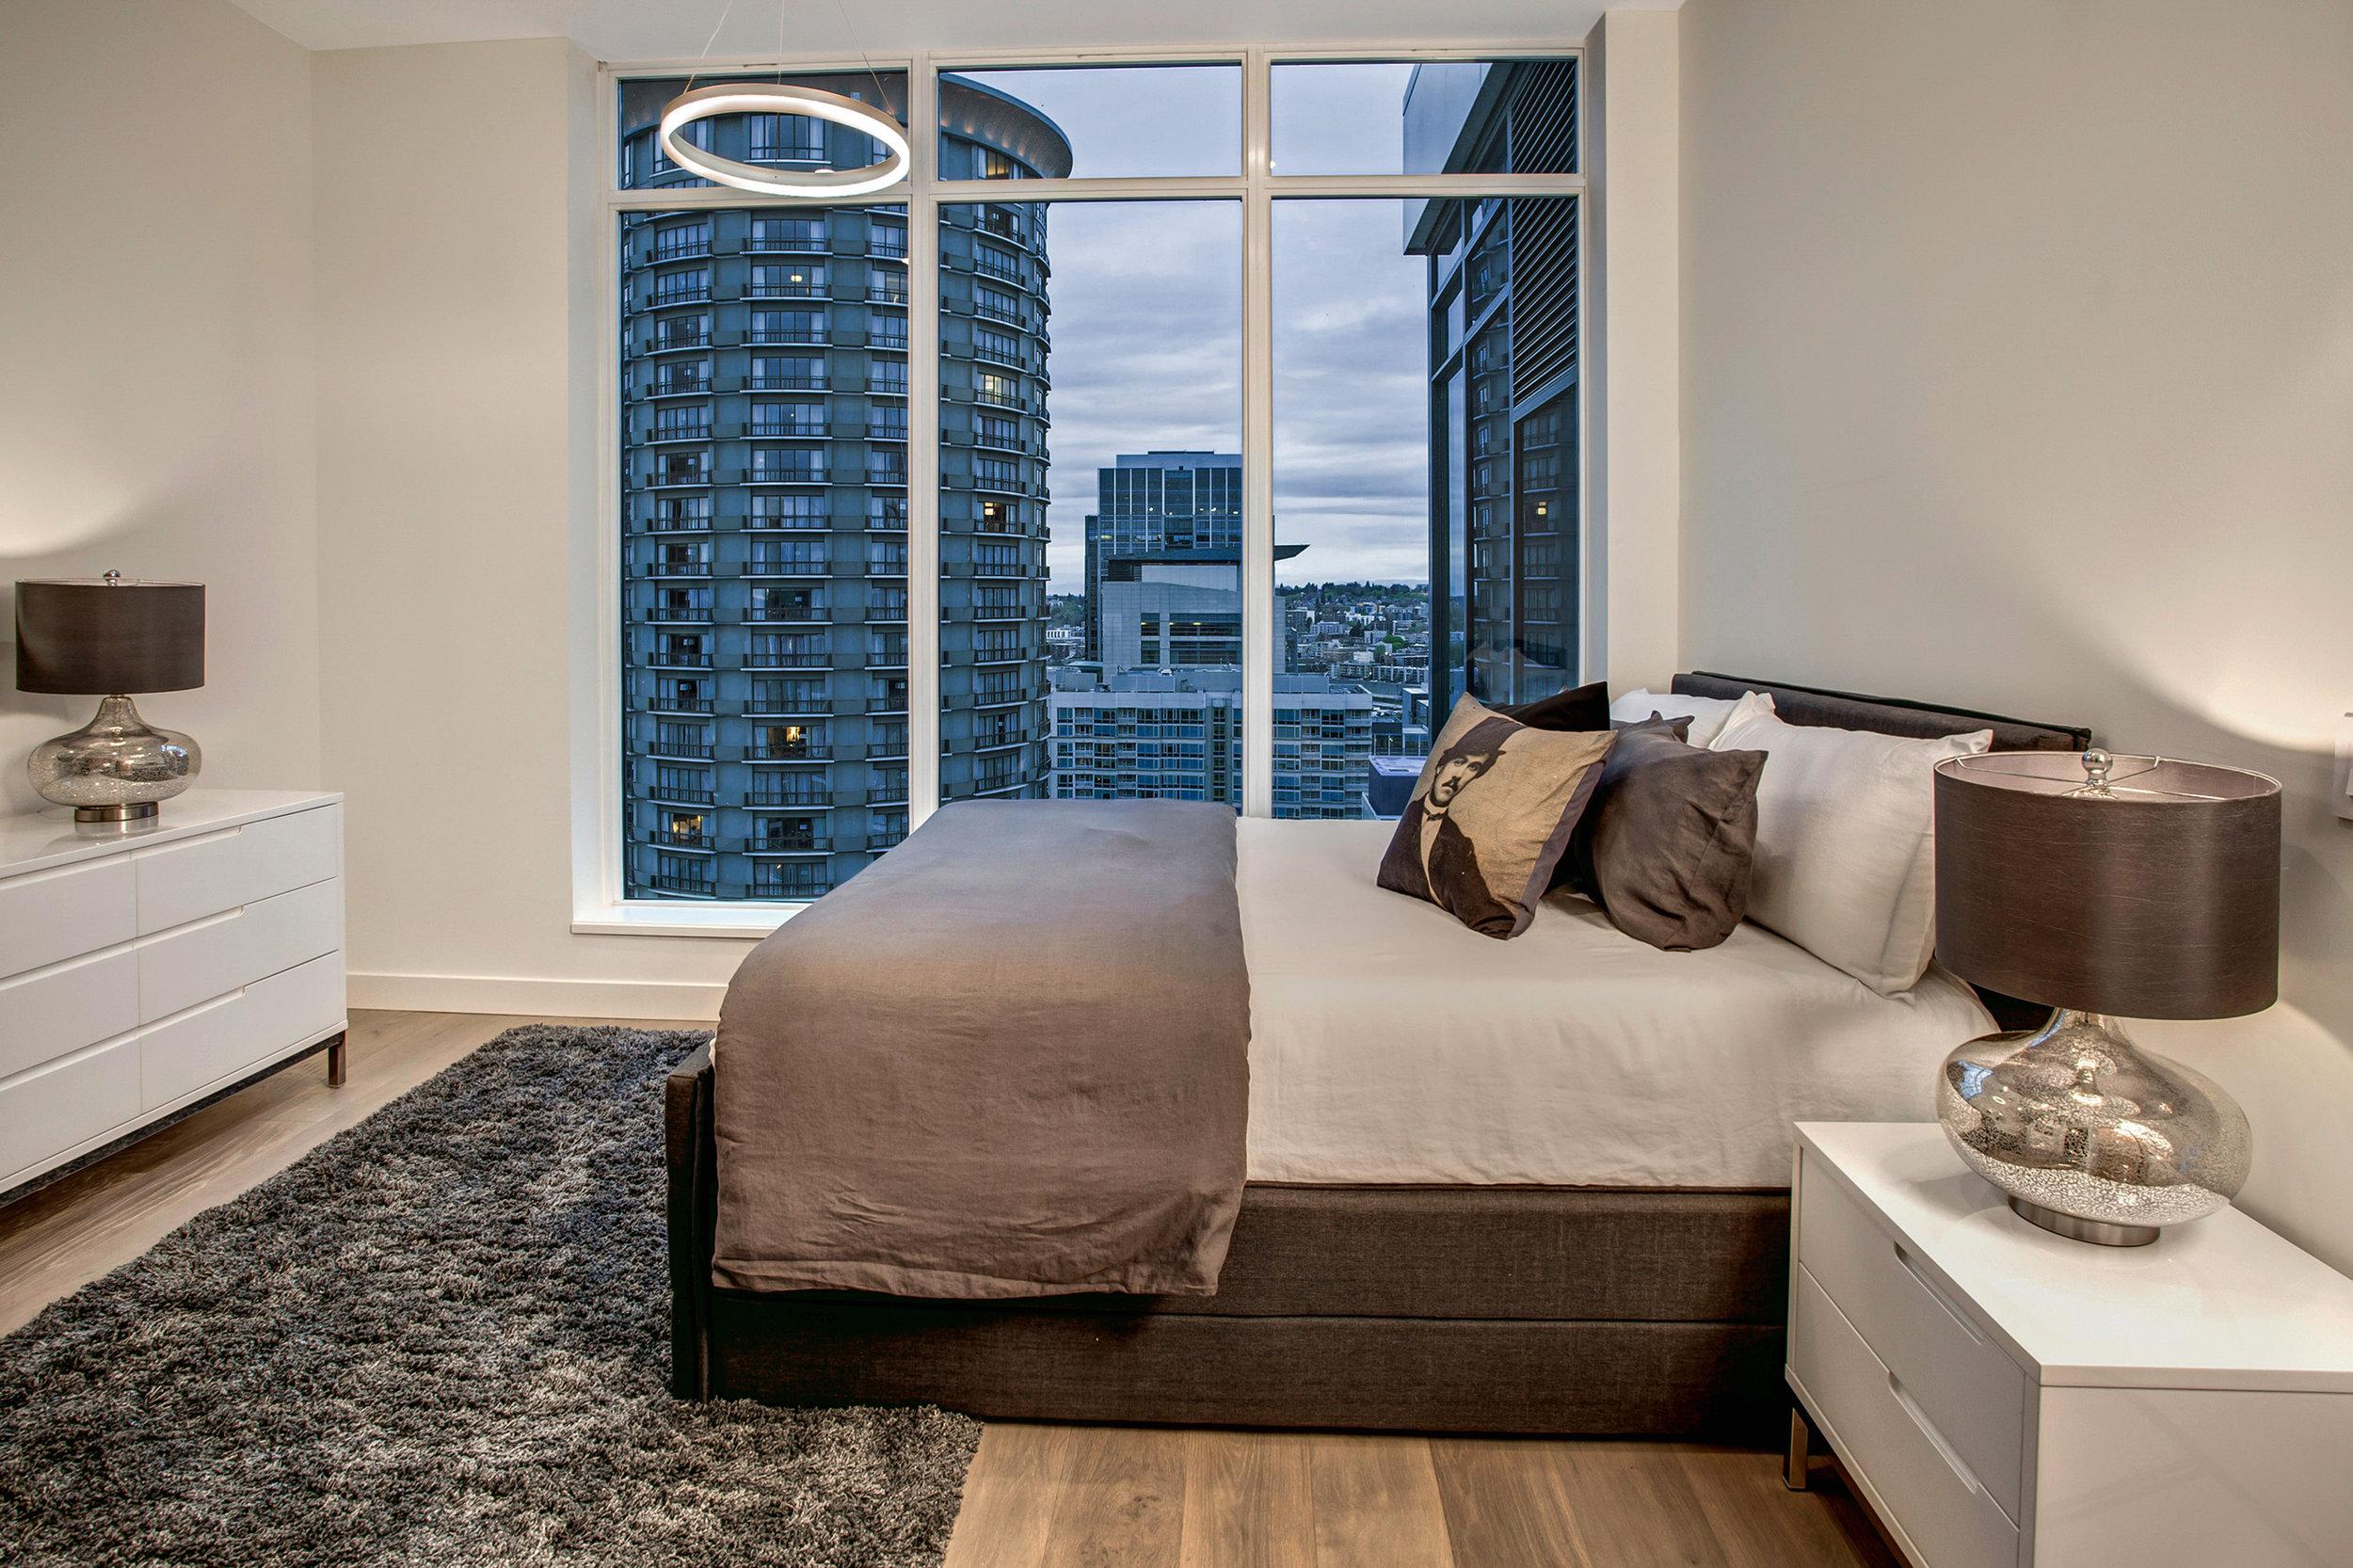 Guest room with en suite bathroom, floor to ceiling windows, and custom built closet.